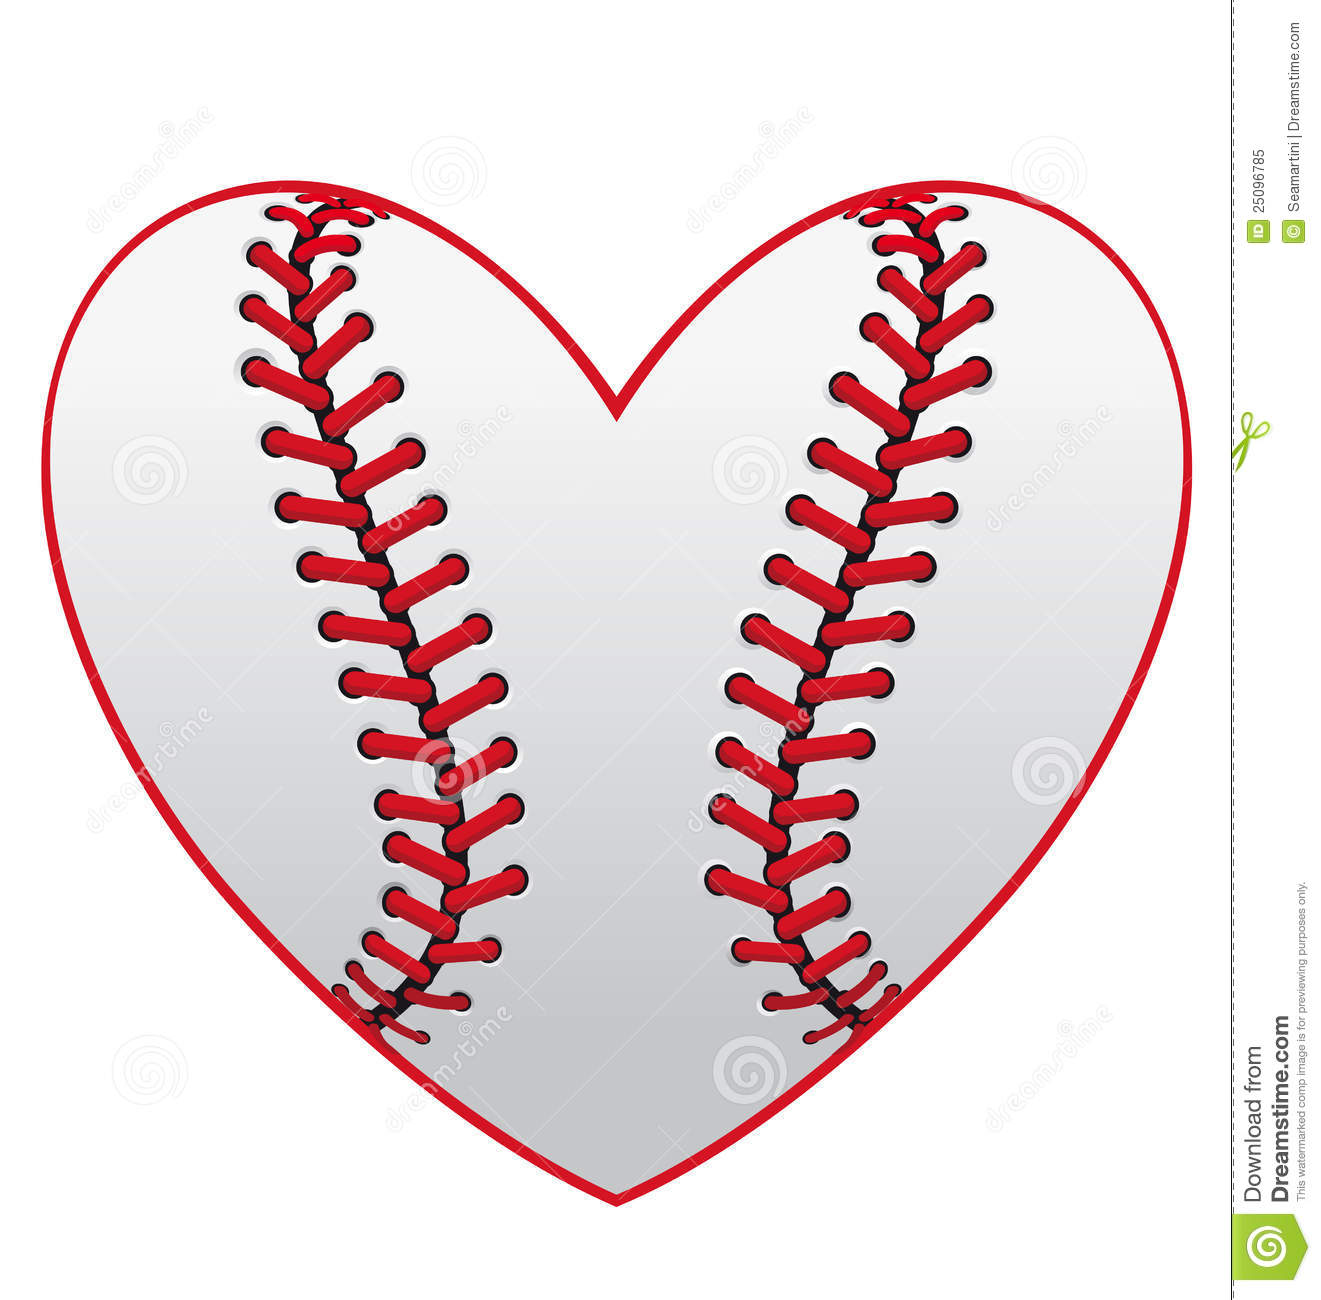 Baseball Heart Clipart Free.